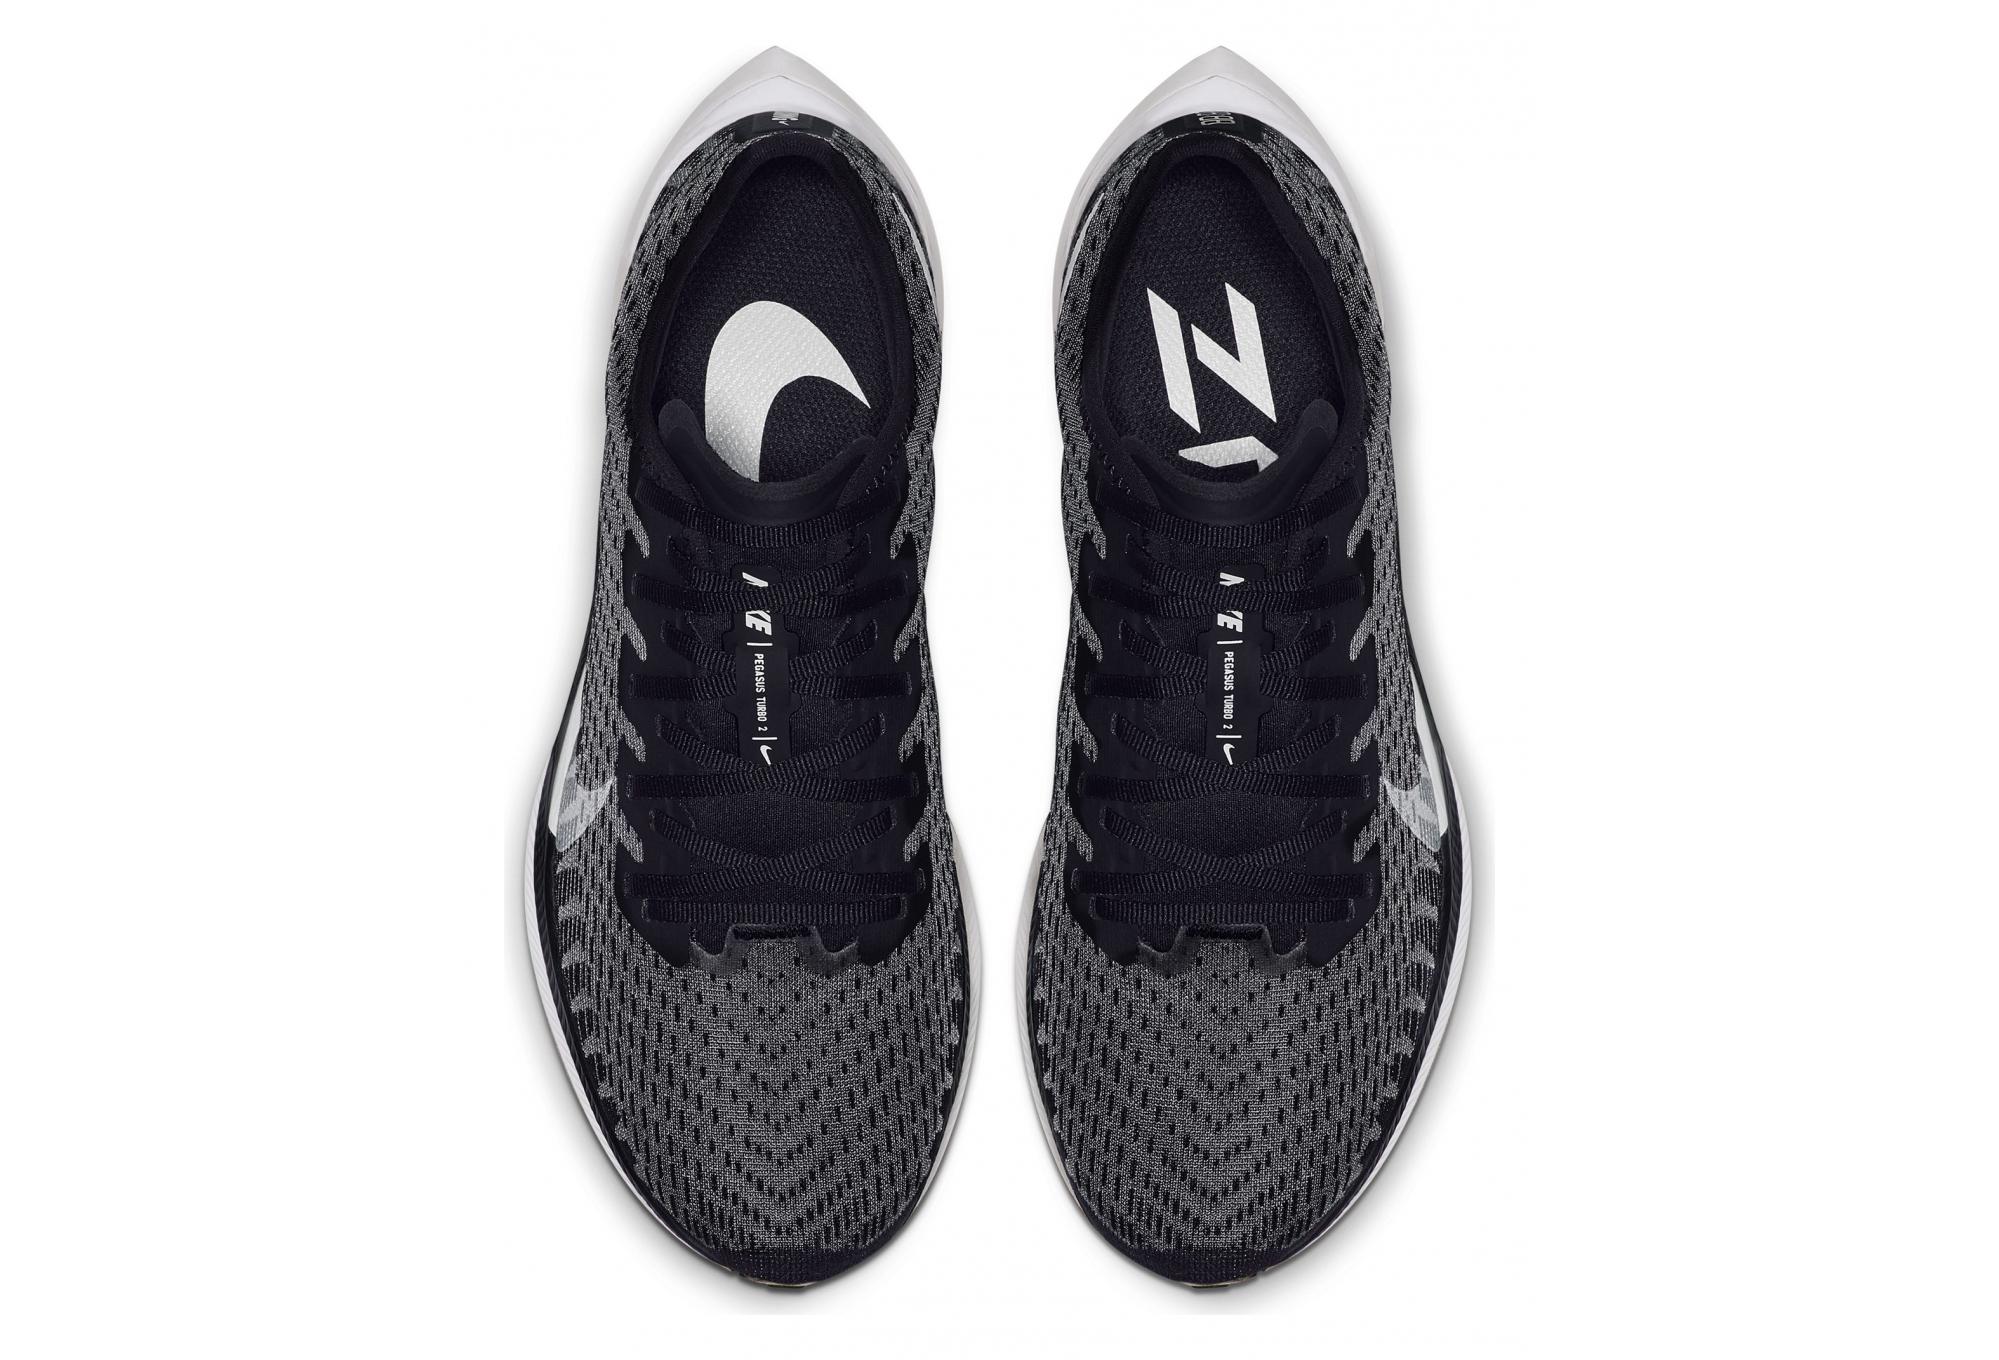 Nike Zoom Pegasus Turbo 2 Black White Women